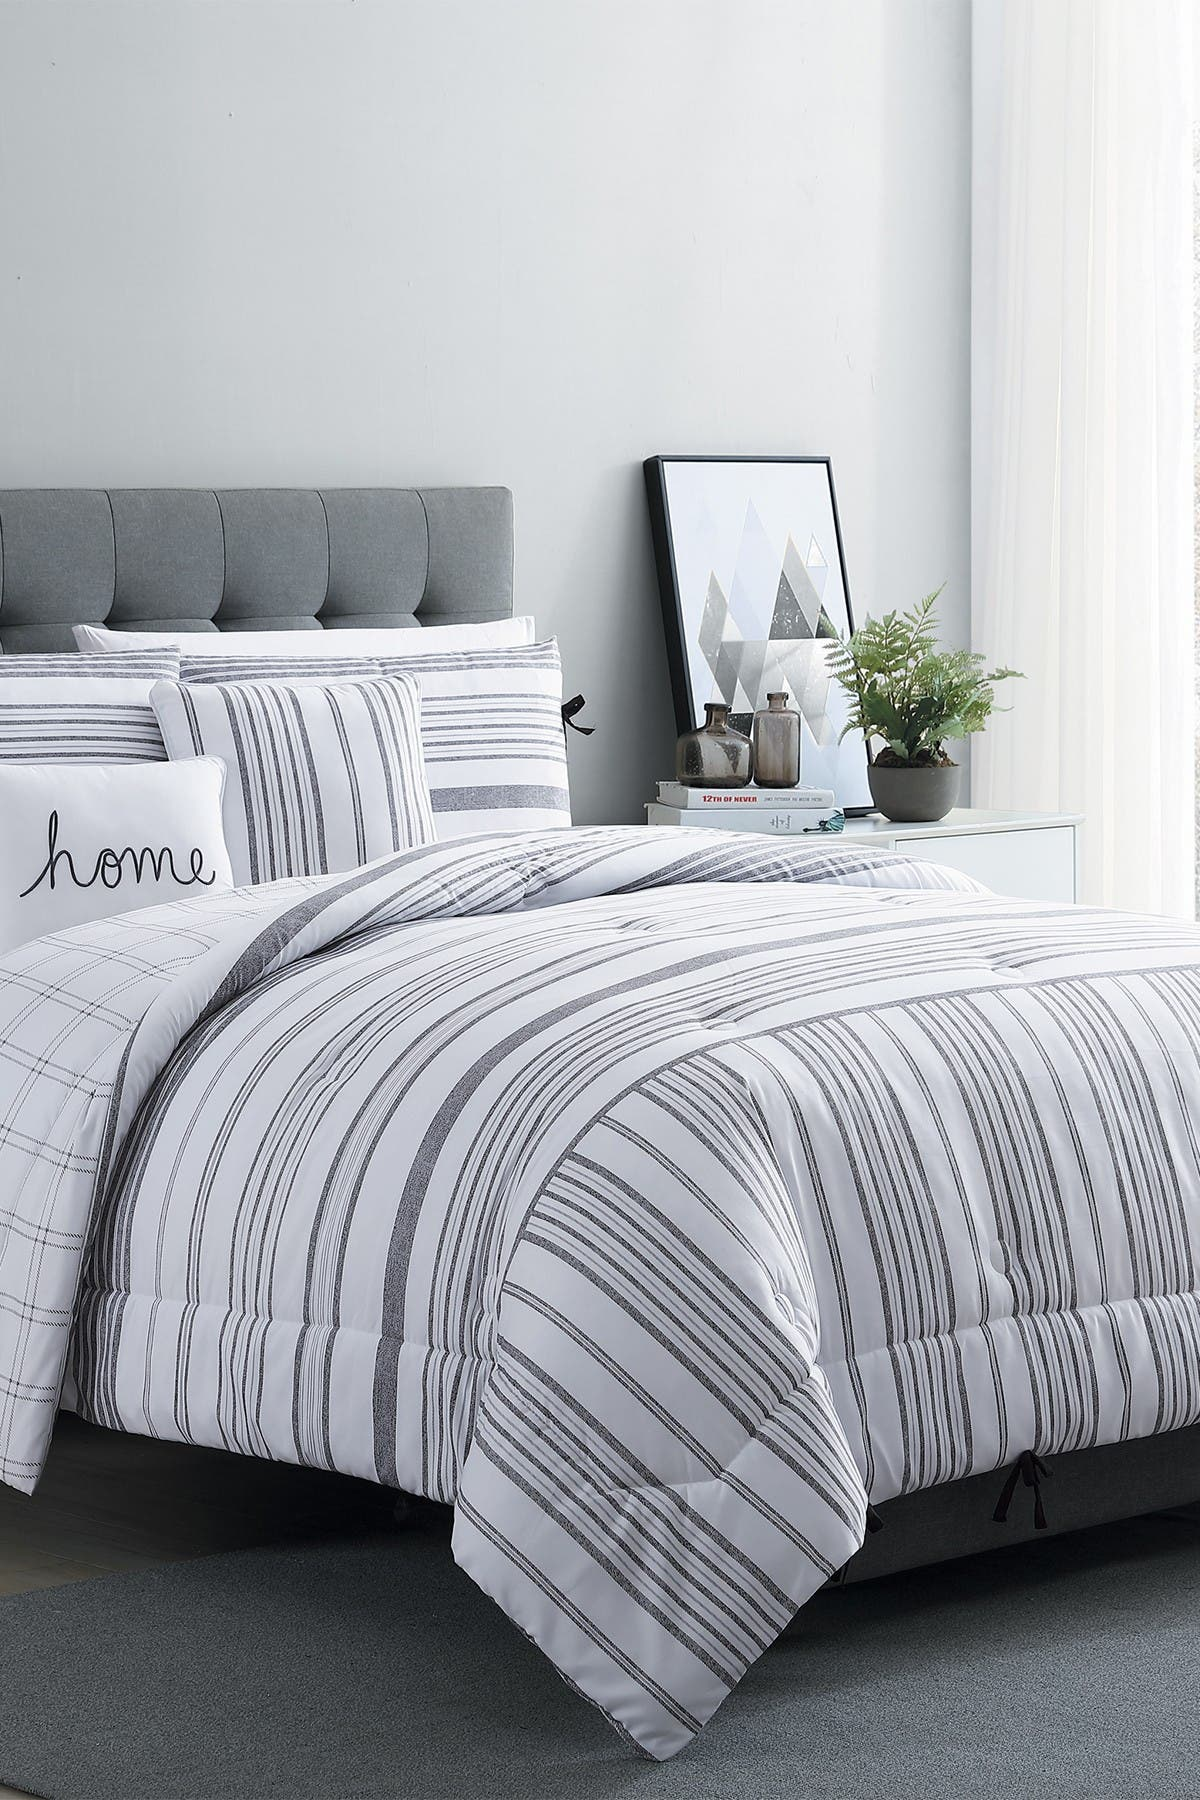 Image of VCNY HOME King Farmhouse Princeton Comforter Set - White/Grey